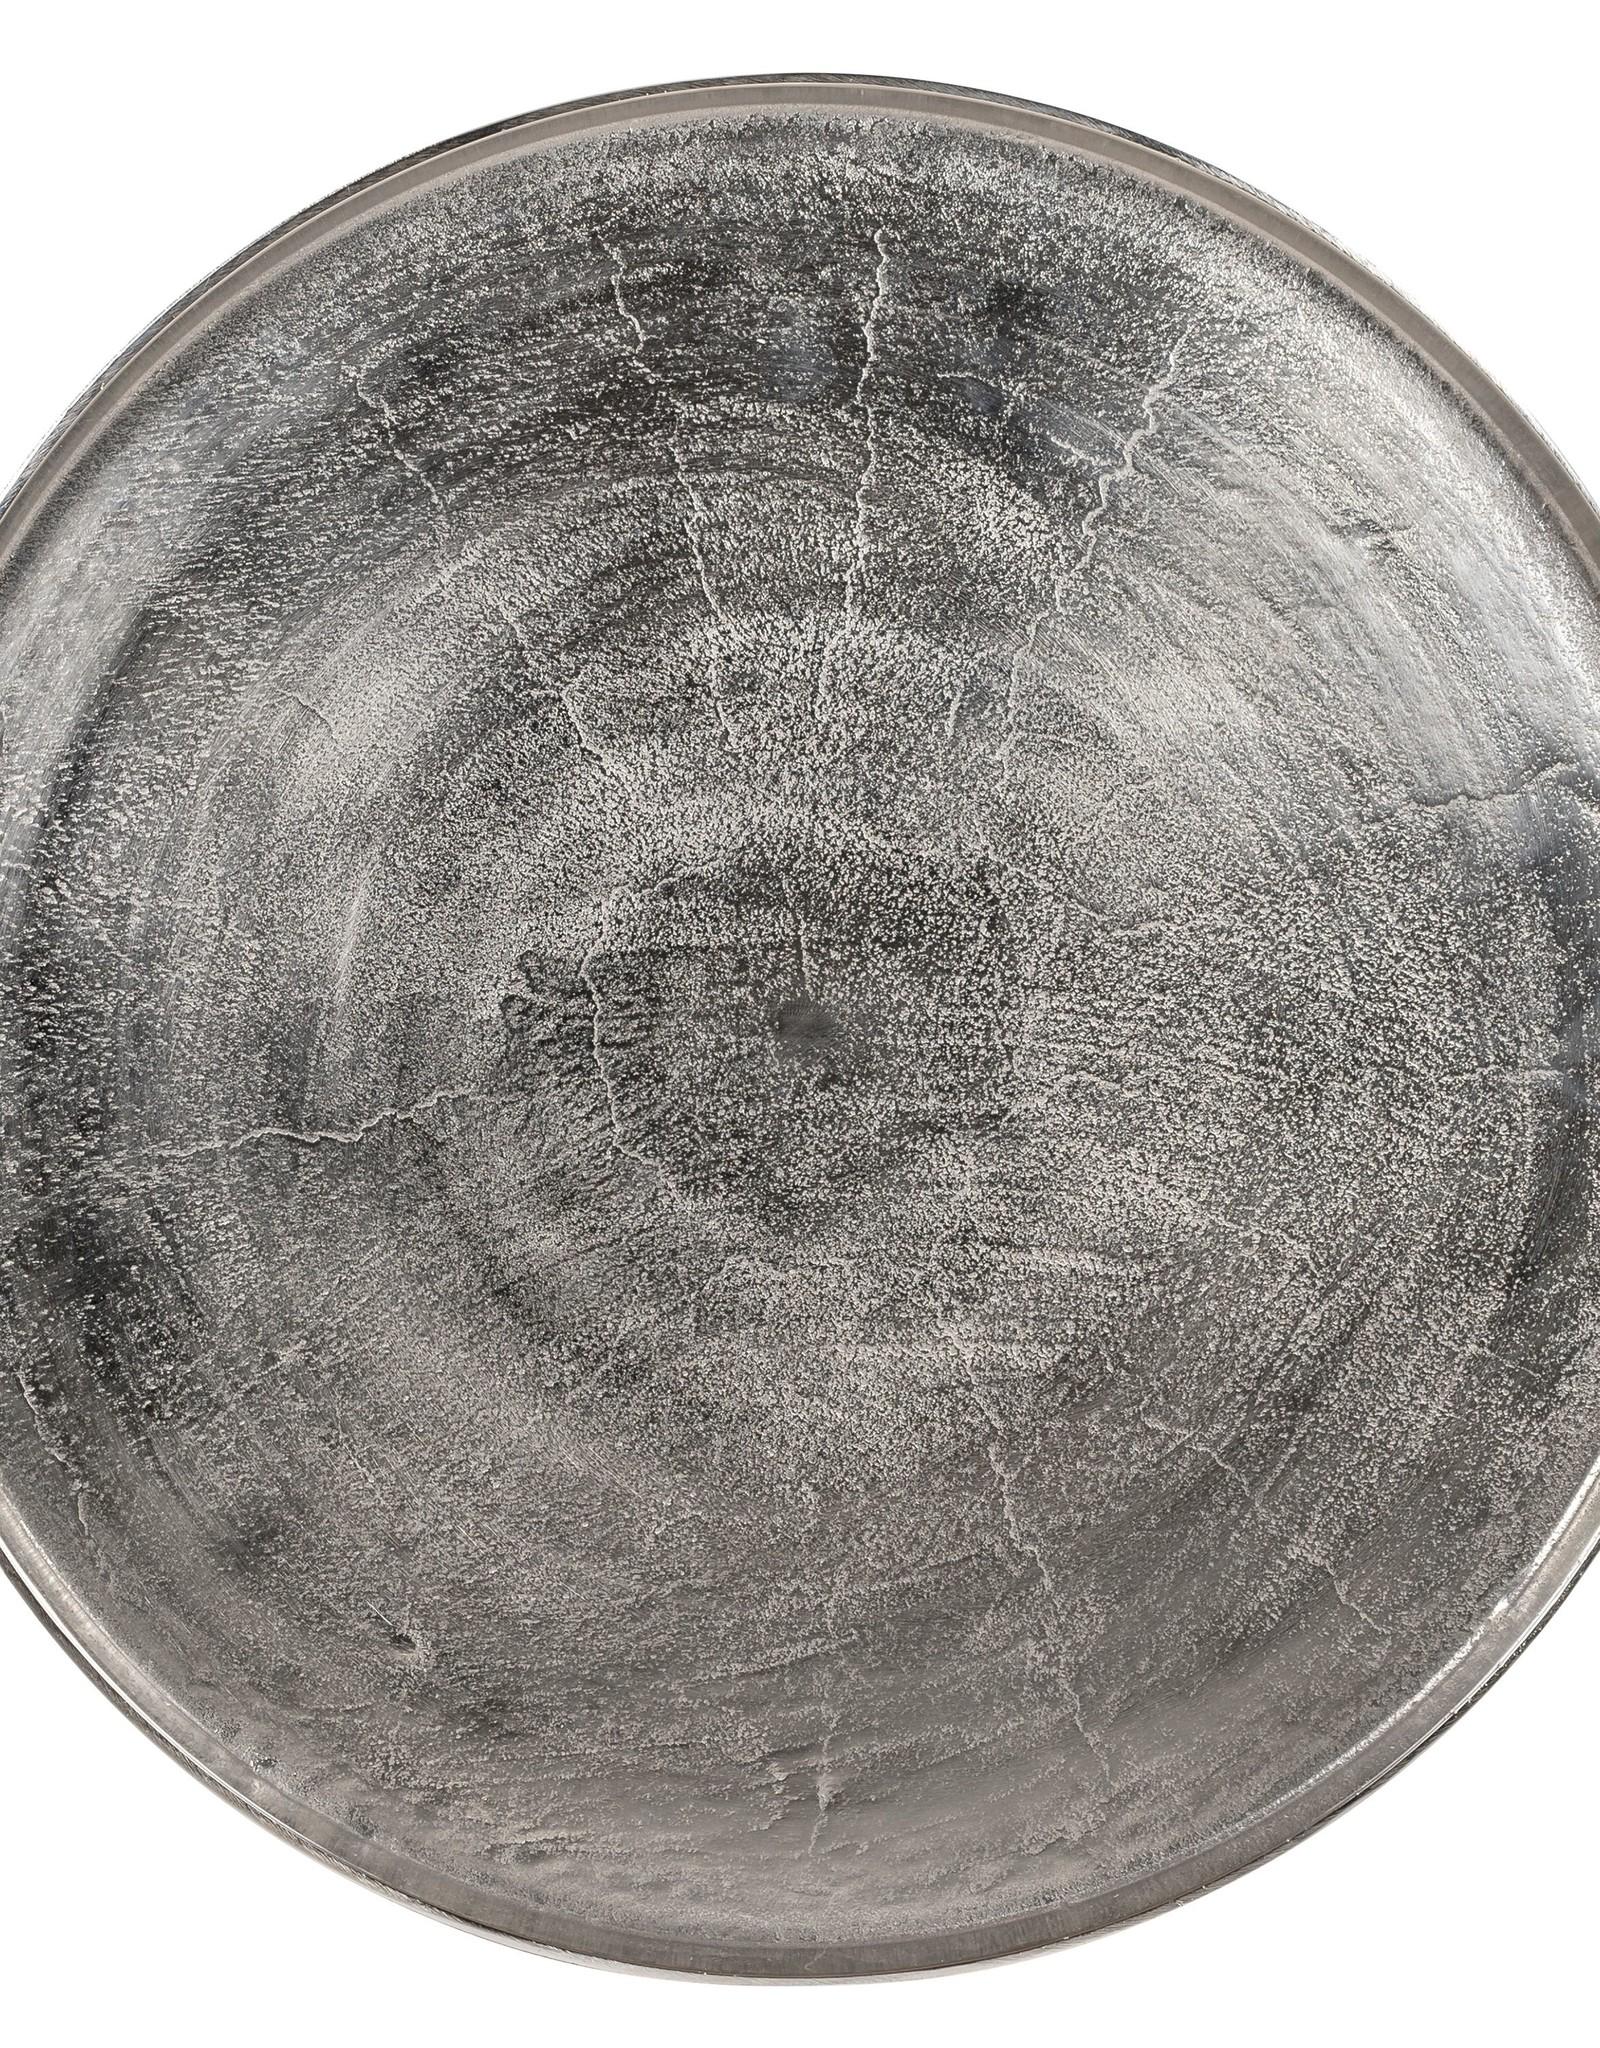 Richmond Interiors Salontafel Lyam aluminium silver 70Ø (Zilver)